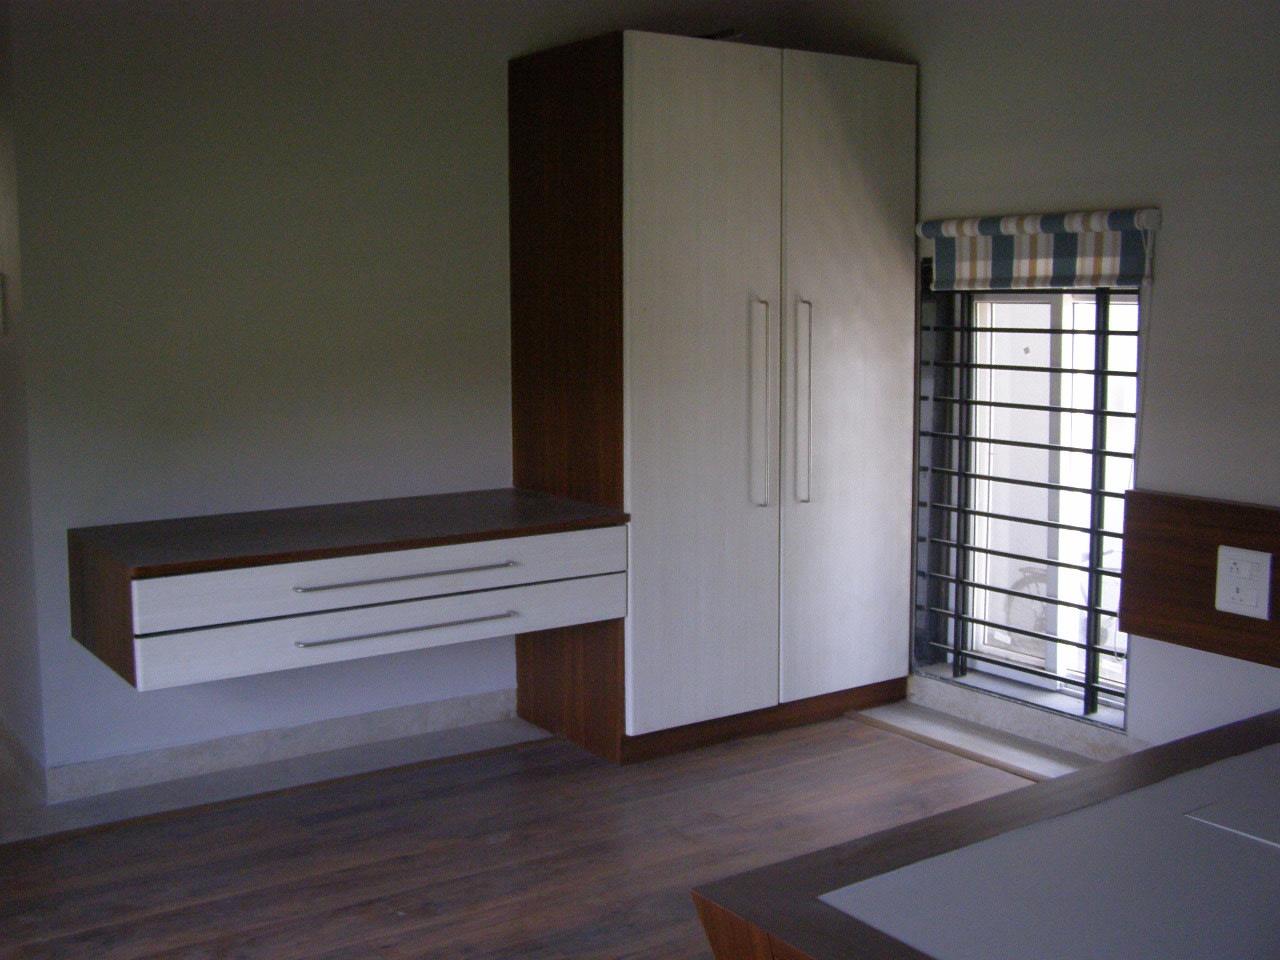 Wooden flooring with wardrobe by Richa Jindal Contemporary   Interior Design Photos & Ideas